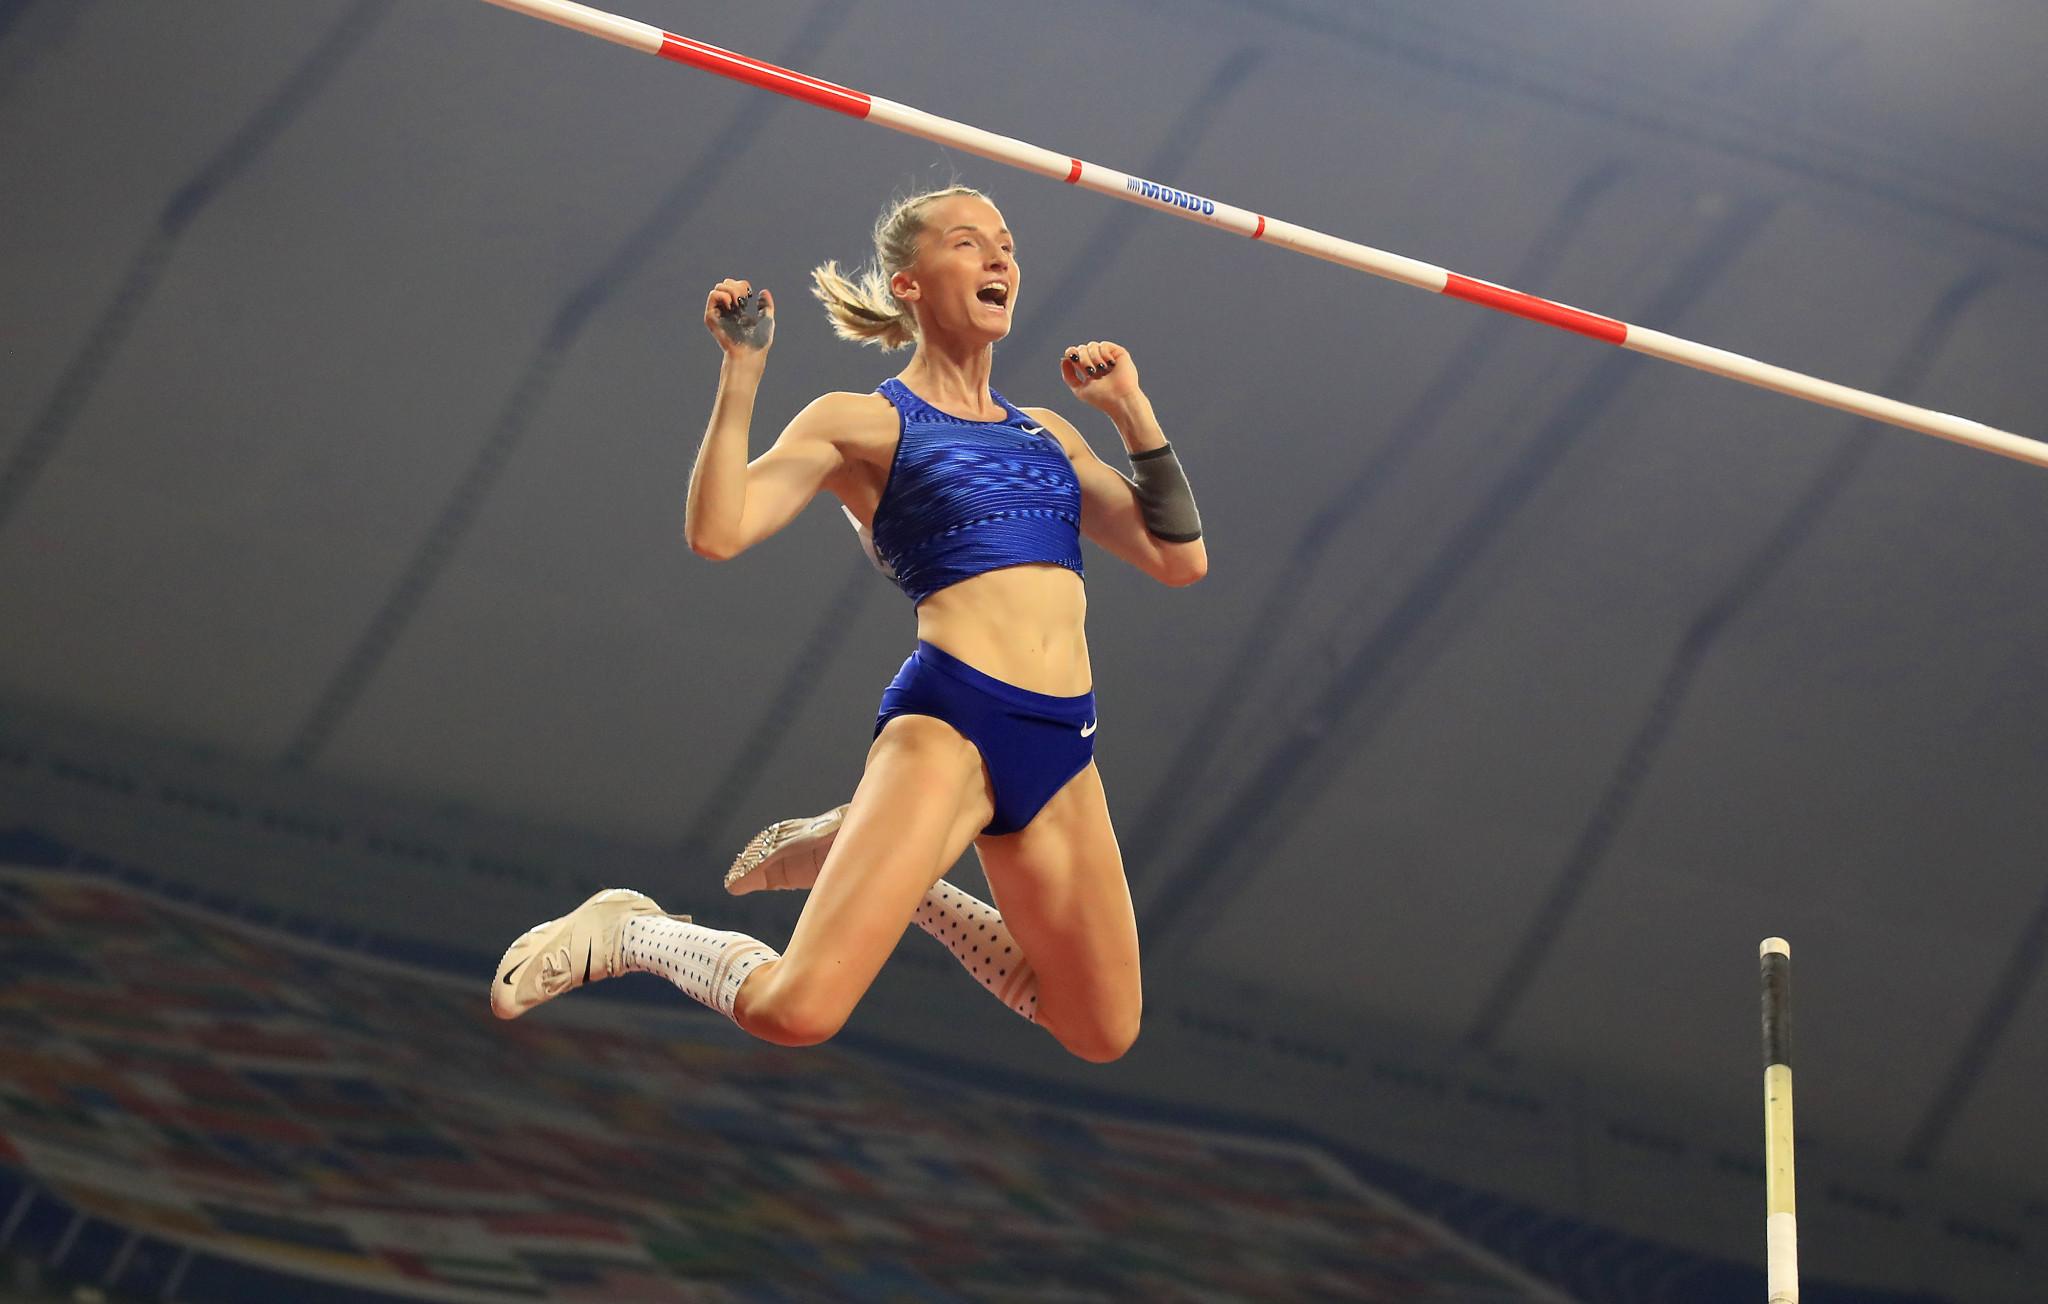 Sidorova and Lasitskene among first Authorised Neutral Athletes for 2021